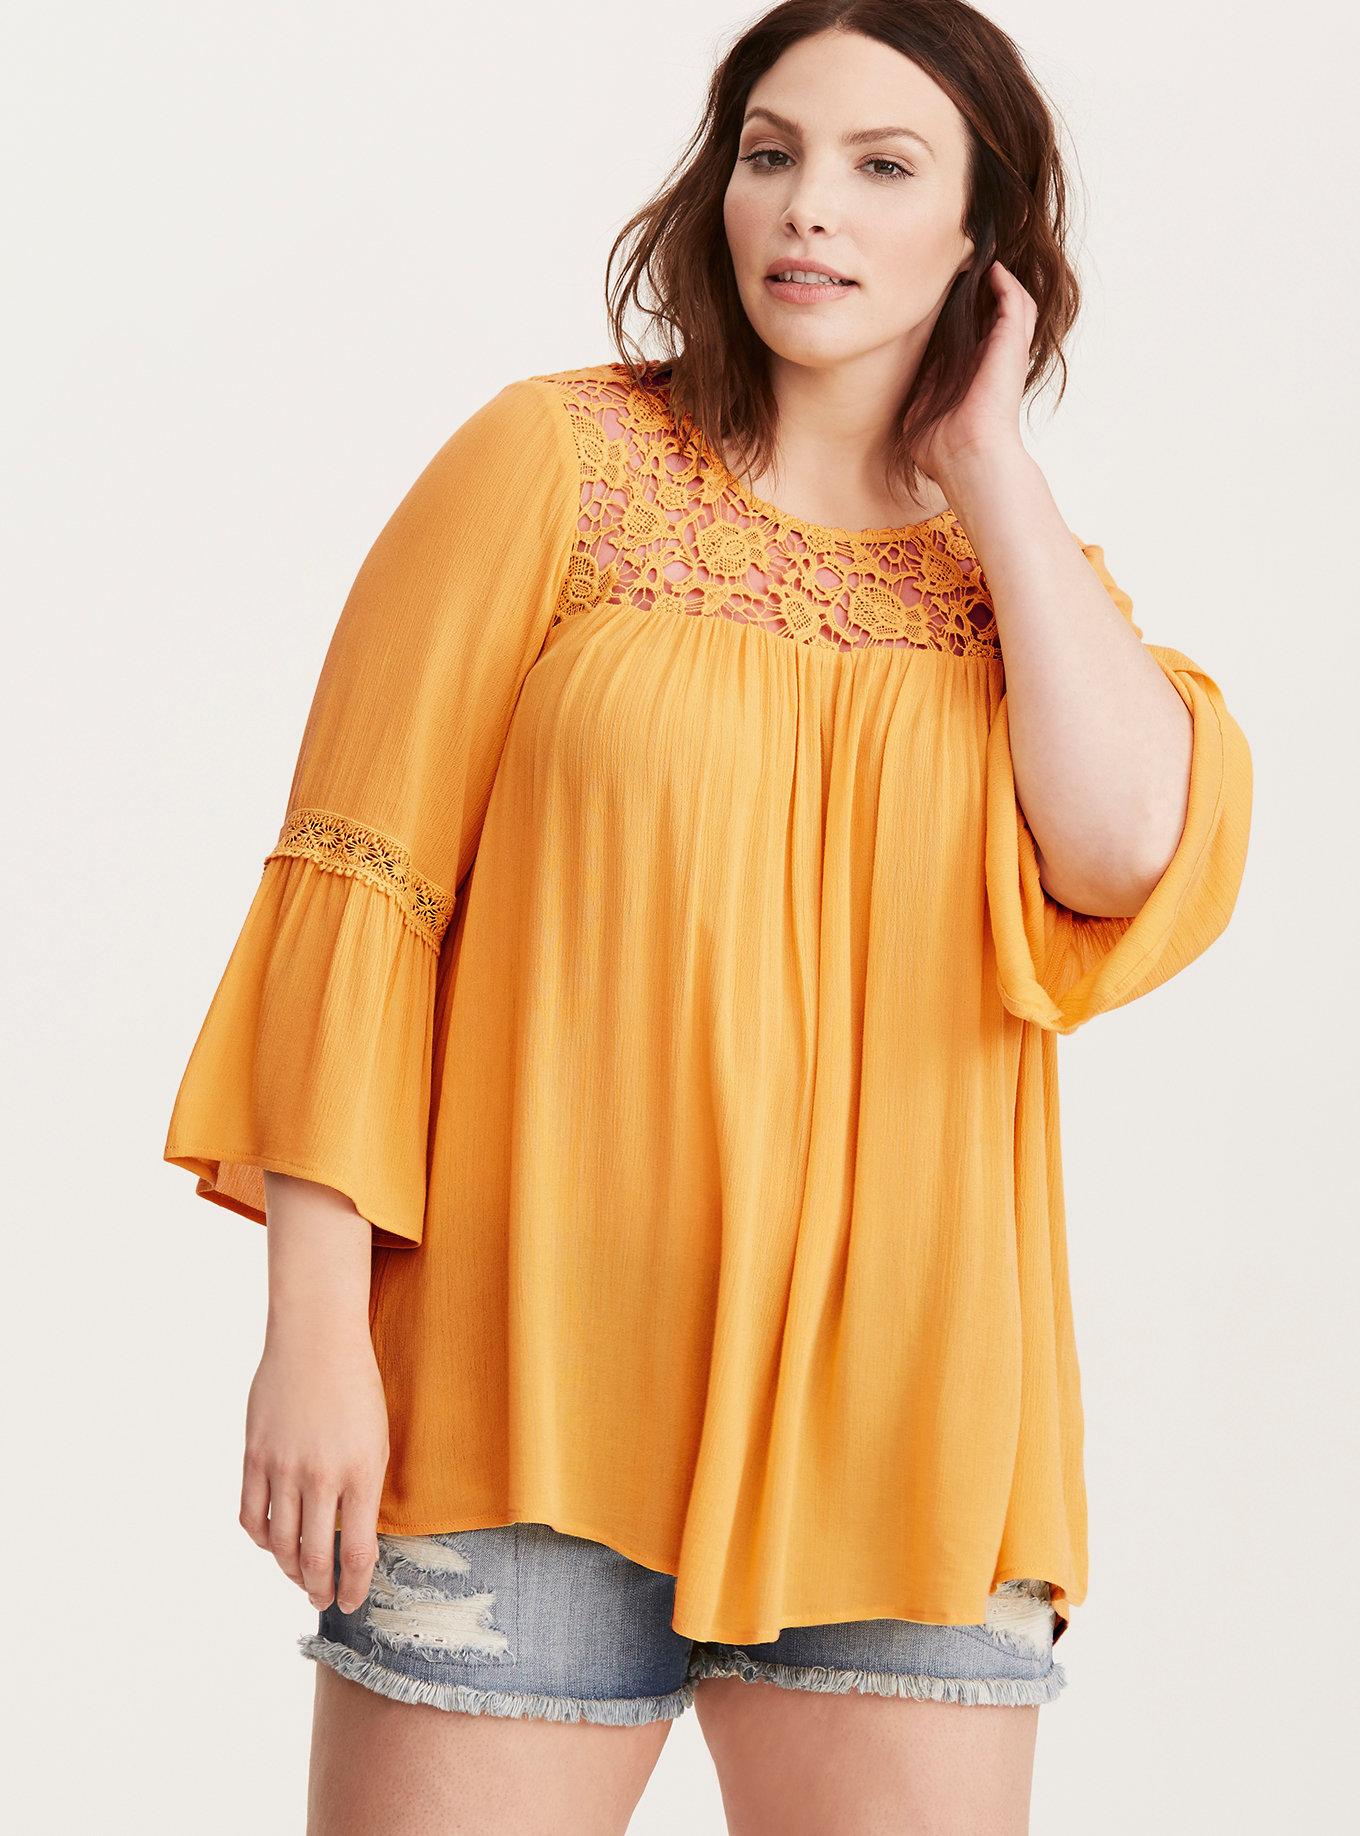 http://www.torrid.com/product/lace-inset-gauze-blouse/10814267.html